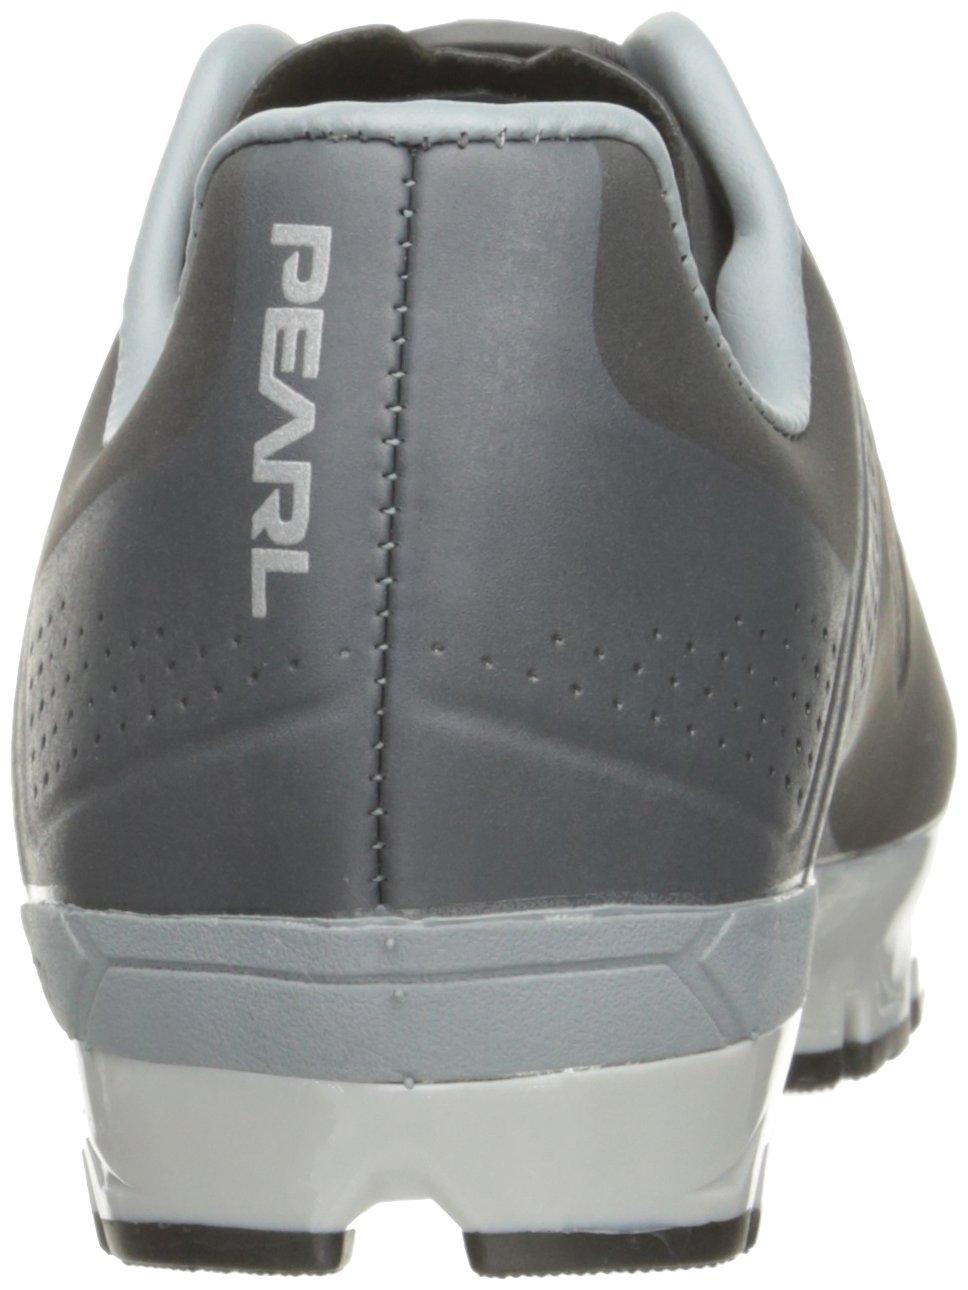 Pearl Izumi Women's w x-Project Elite Cycling Shoe, Black/Monument Grey, 40 EU/8.4 B US by Pearl iZUMi (Image #2)